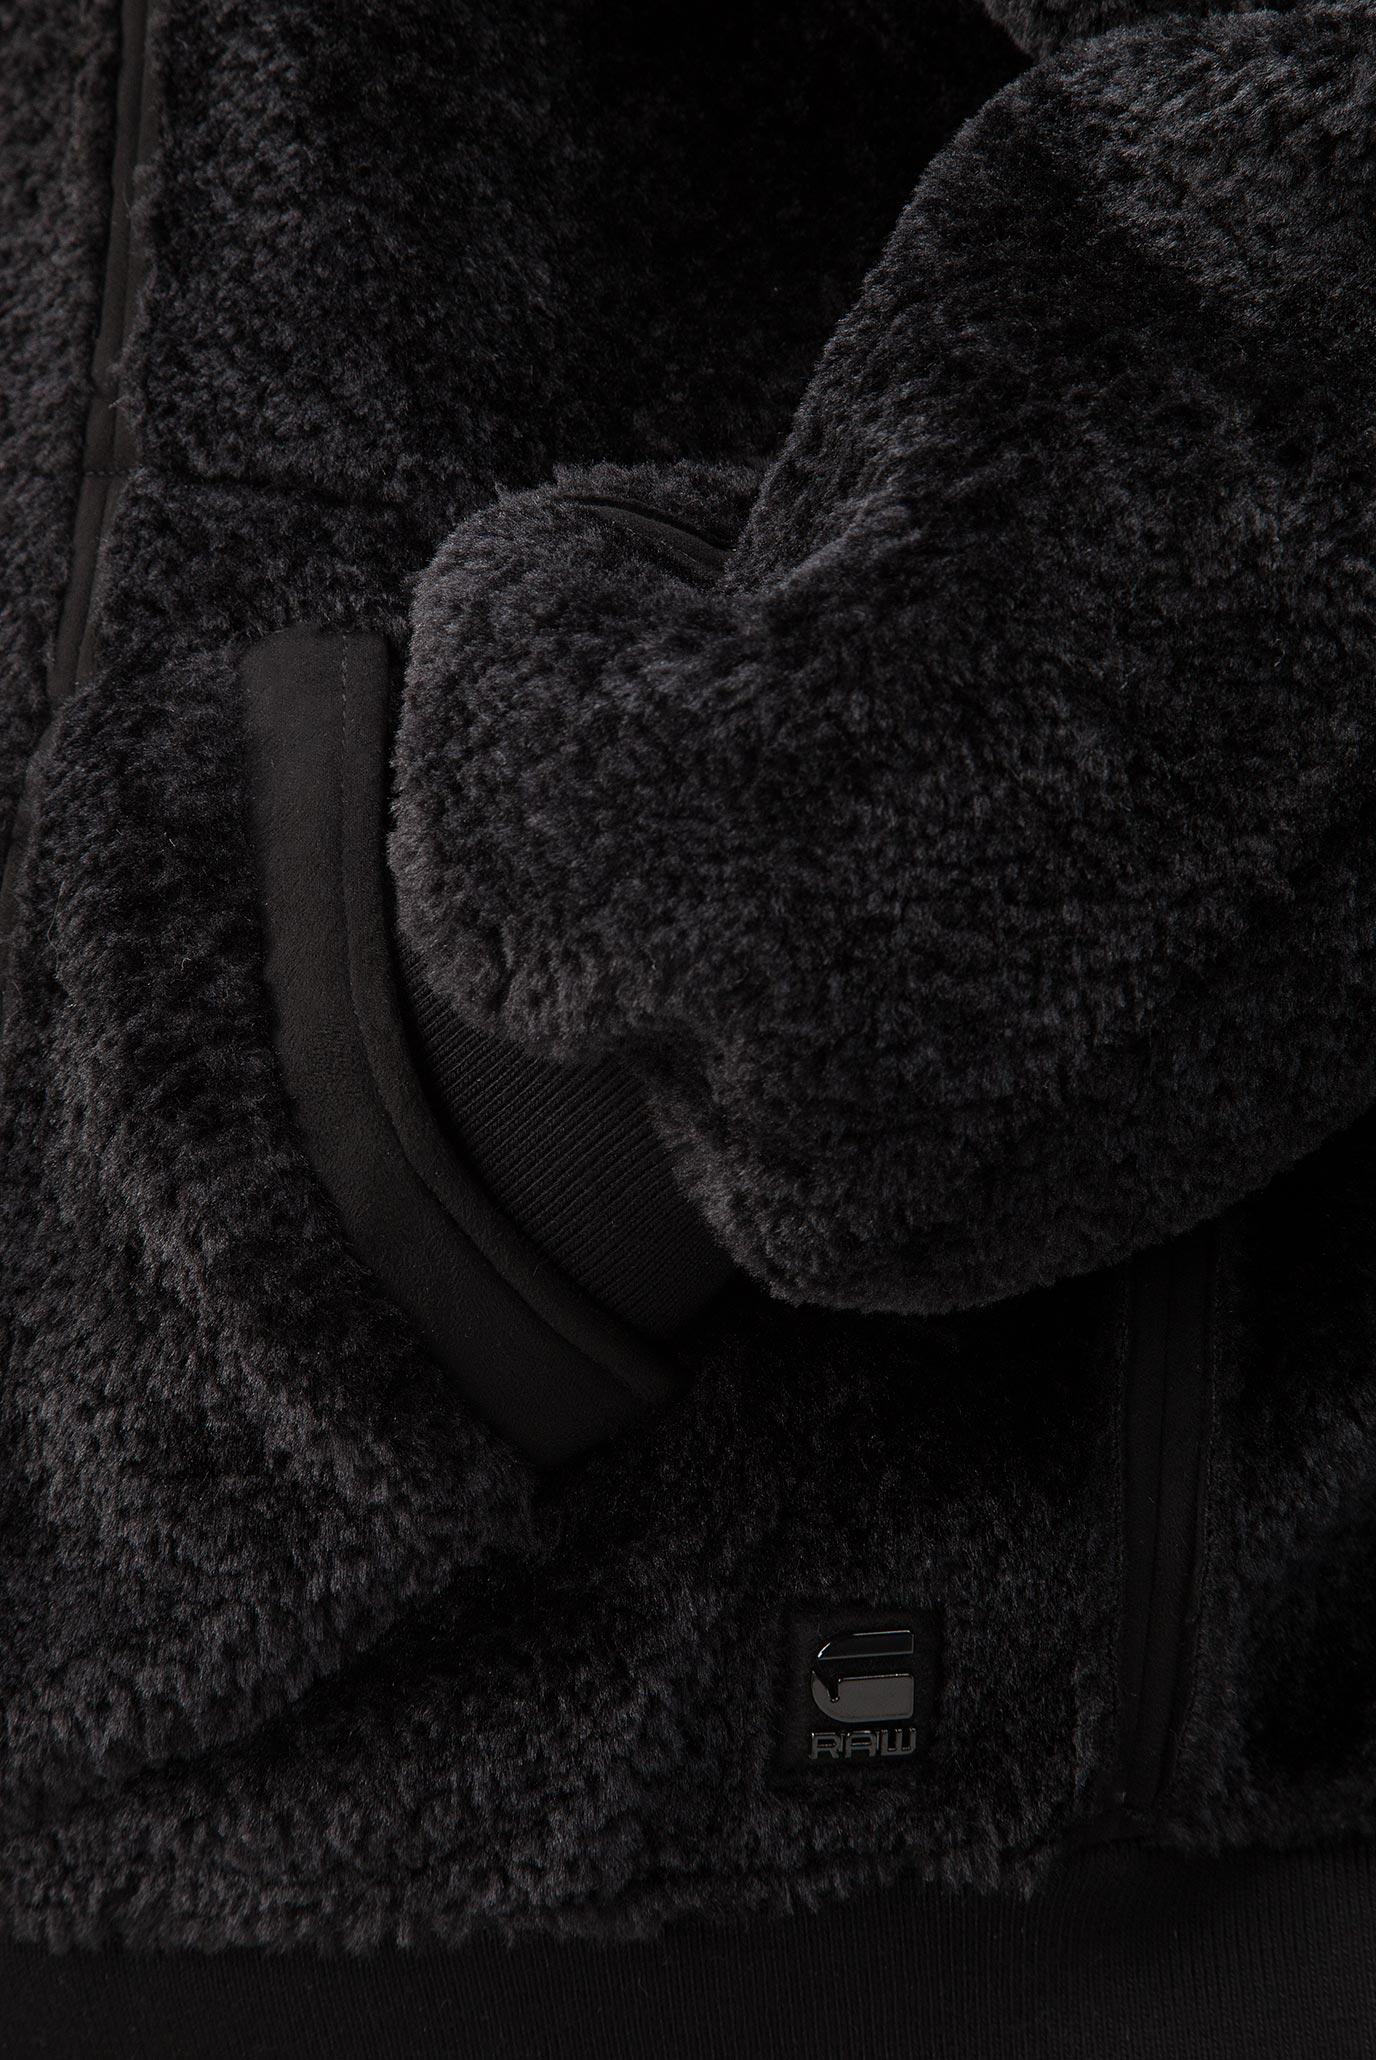 Купить Женский черный двусторонний бомбер Deline teddy  G-Star RAW G-Star RAW D10340,9096 – Киев, Украина. Цены в интернет магазине MD Fashion